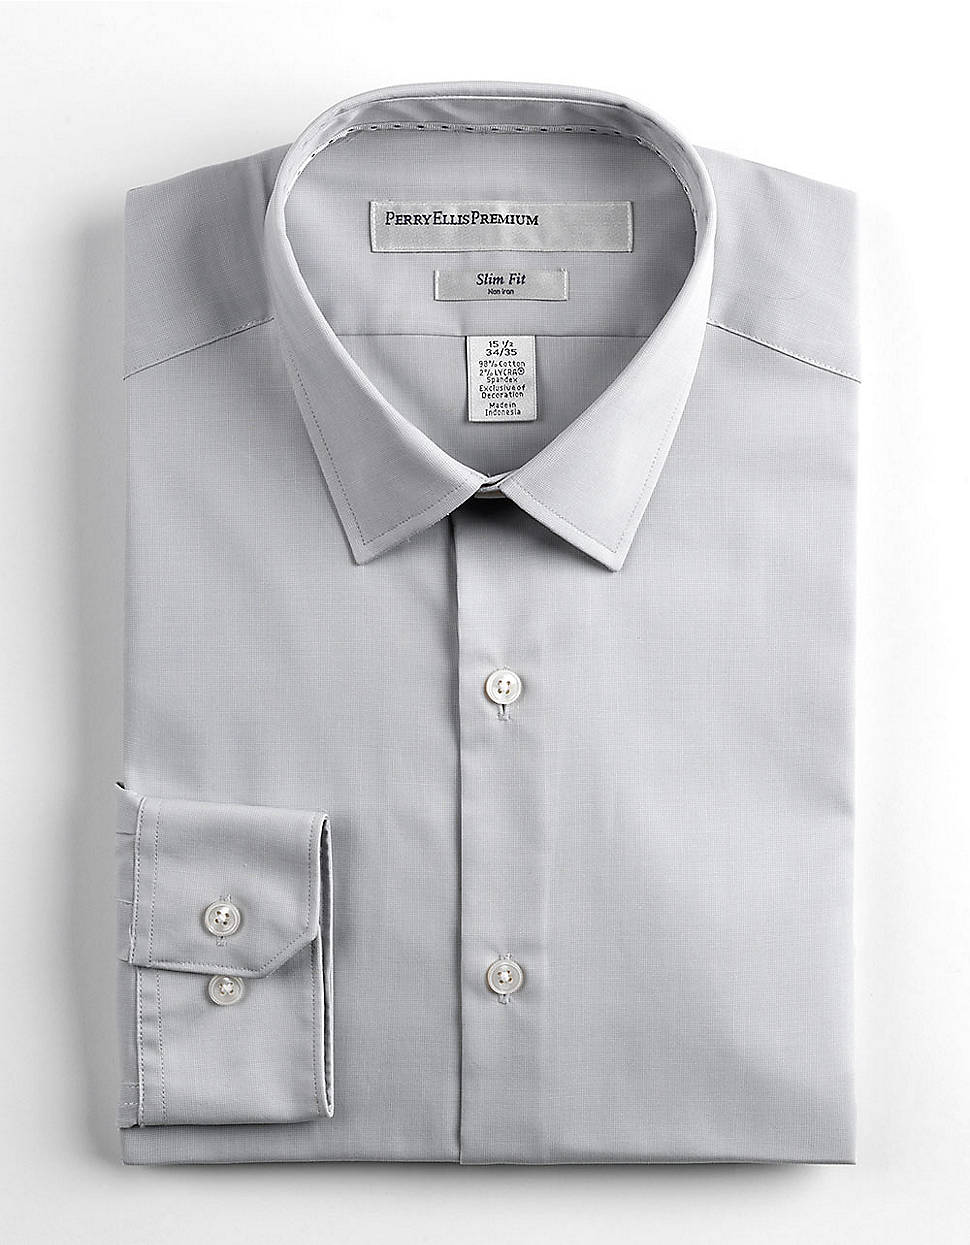 Lyst Perry Ellis Slimfit Dress Shirt In Gray For Men